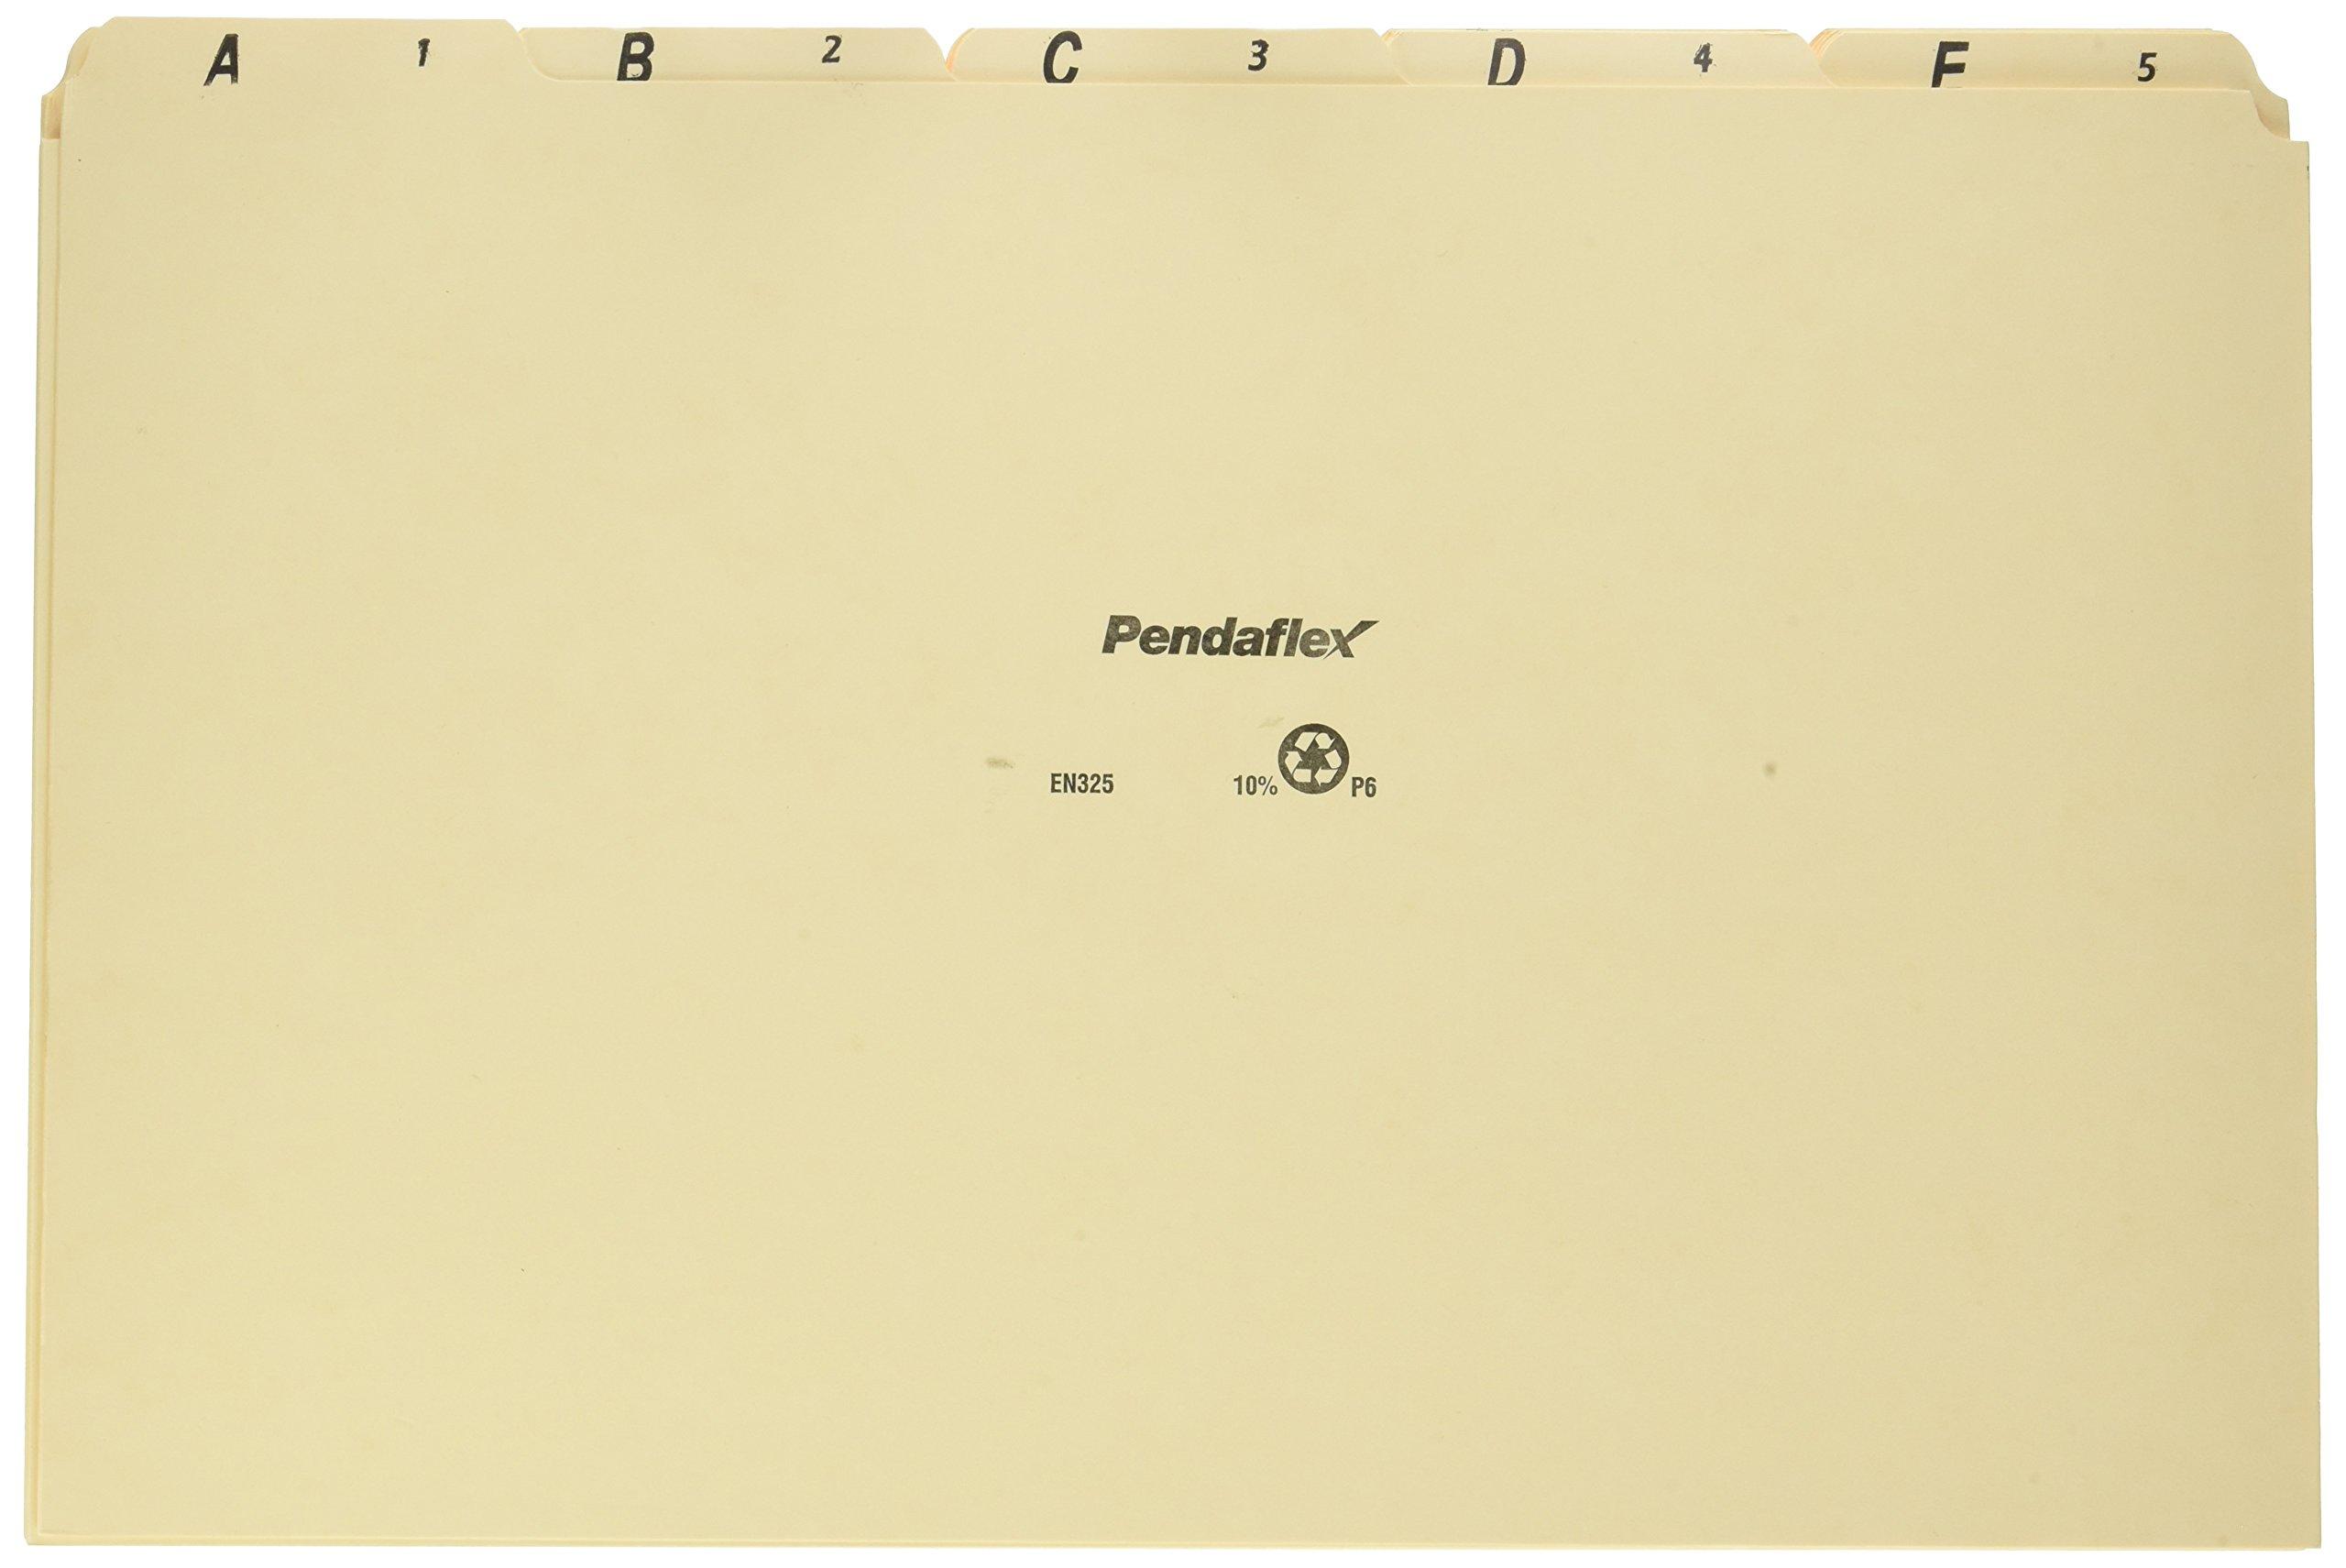 Pendaflex EN325 A-Z Top Tab Recycled File Guides, 18 pt. Manila, 1/5 Tab, Legal Size, 25/set